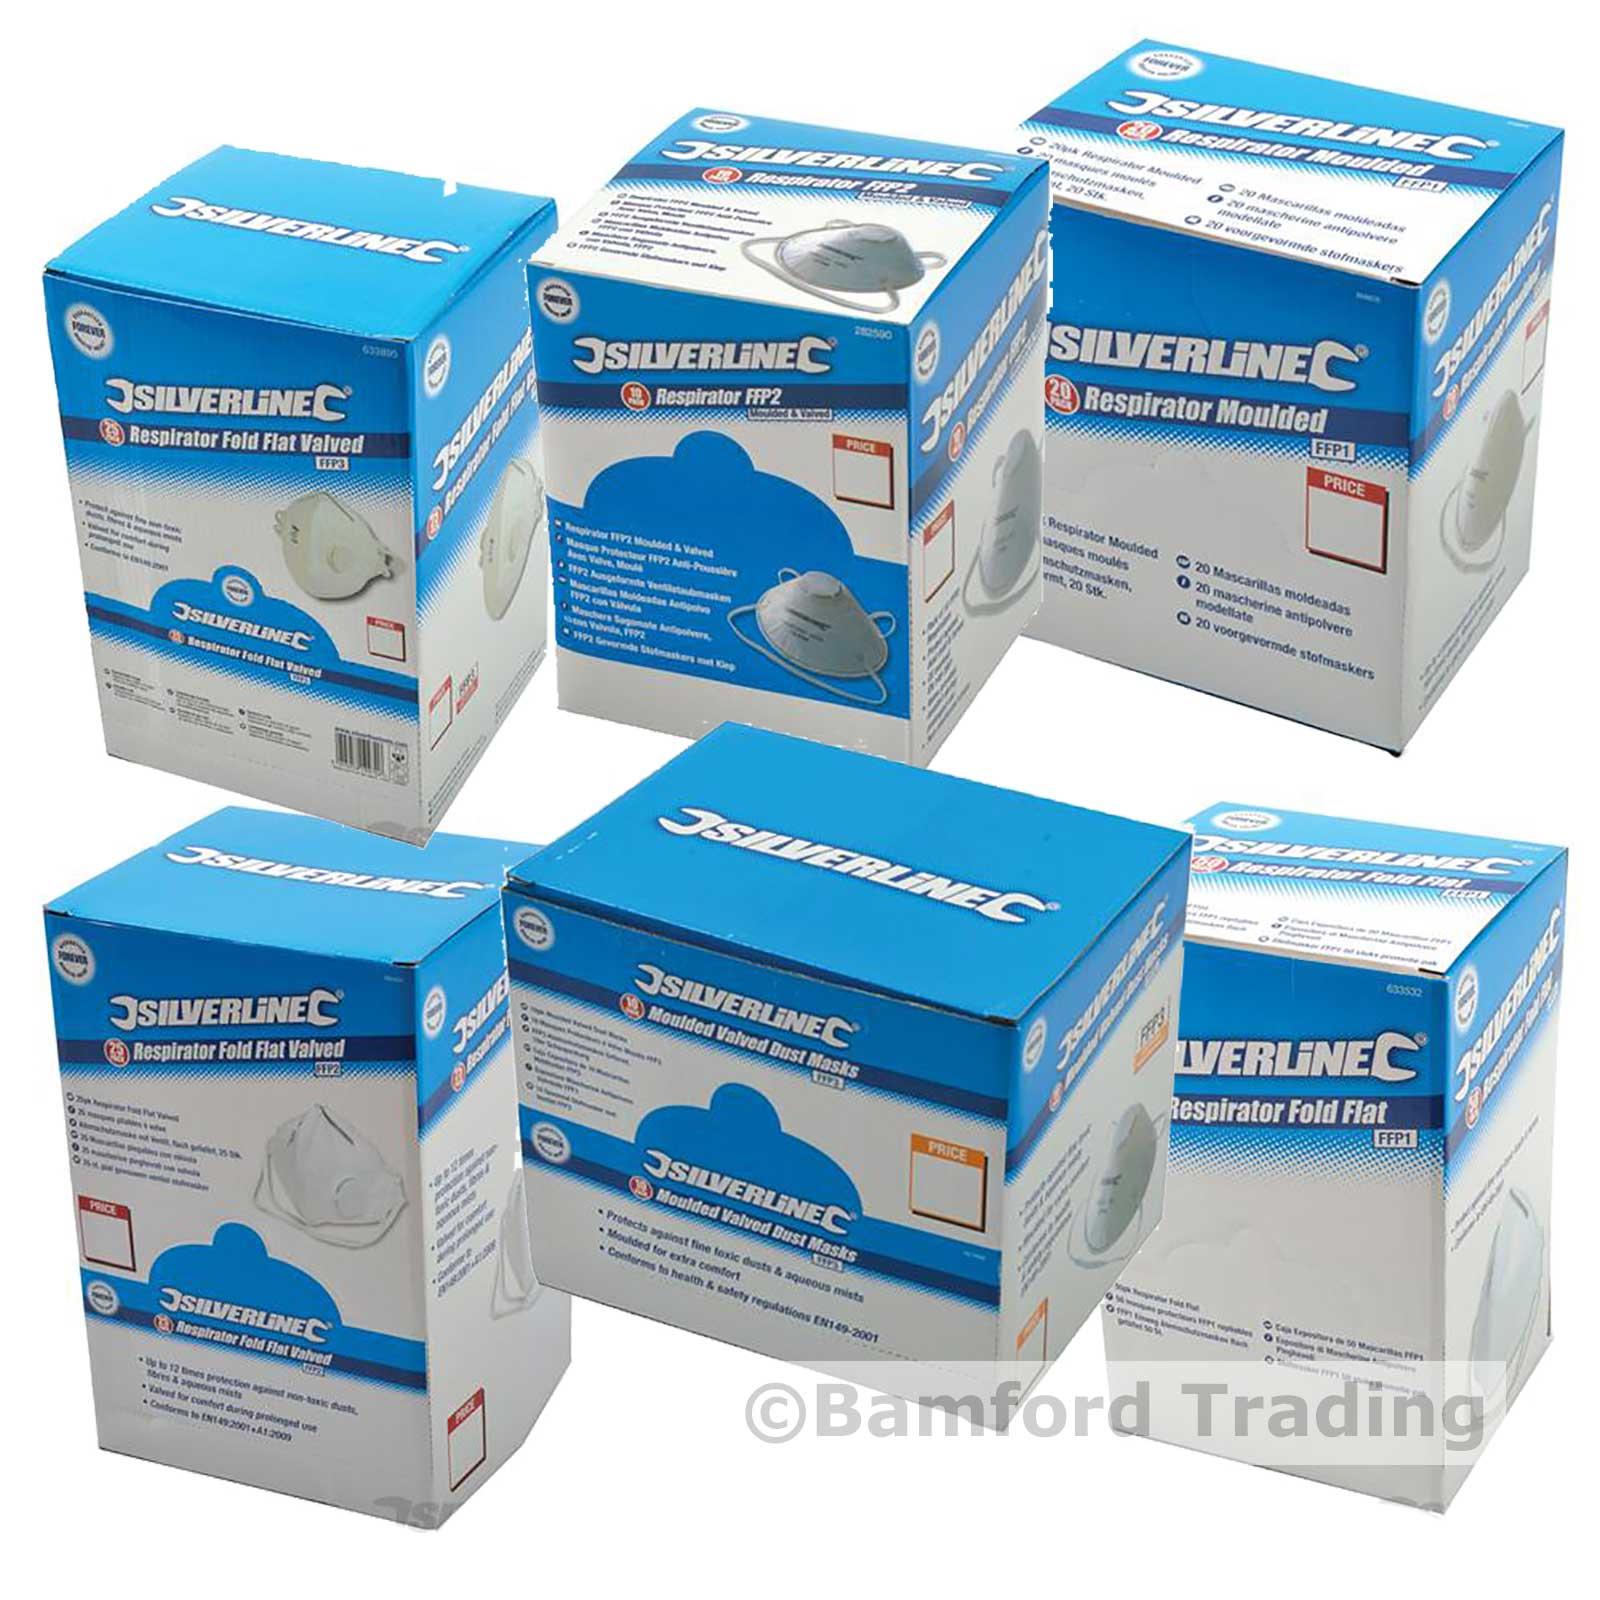 Silverline Disposable Dust Masks | Silverline Disposable Dust Masks ...